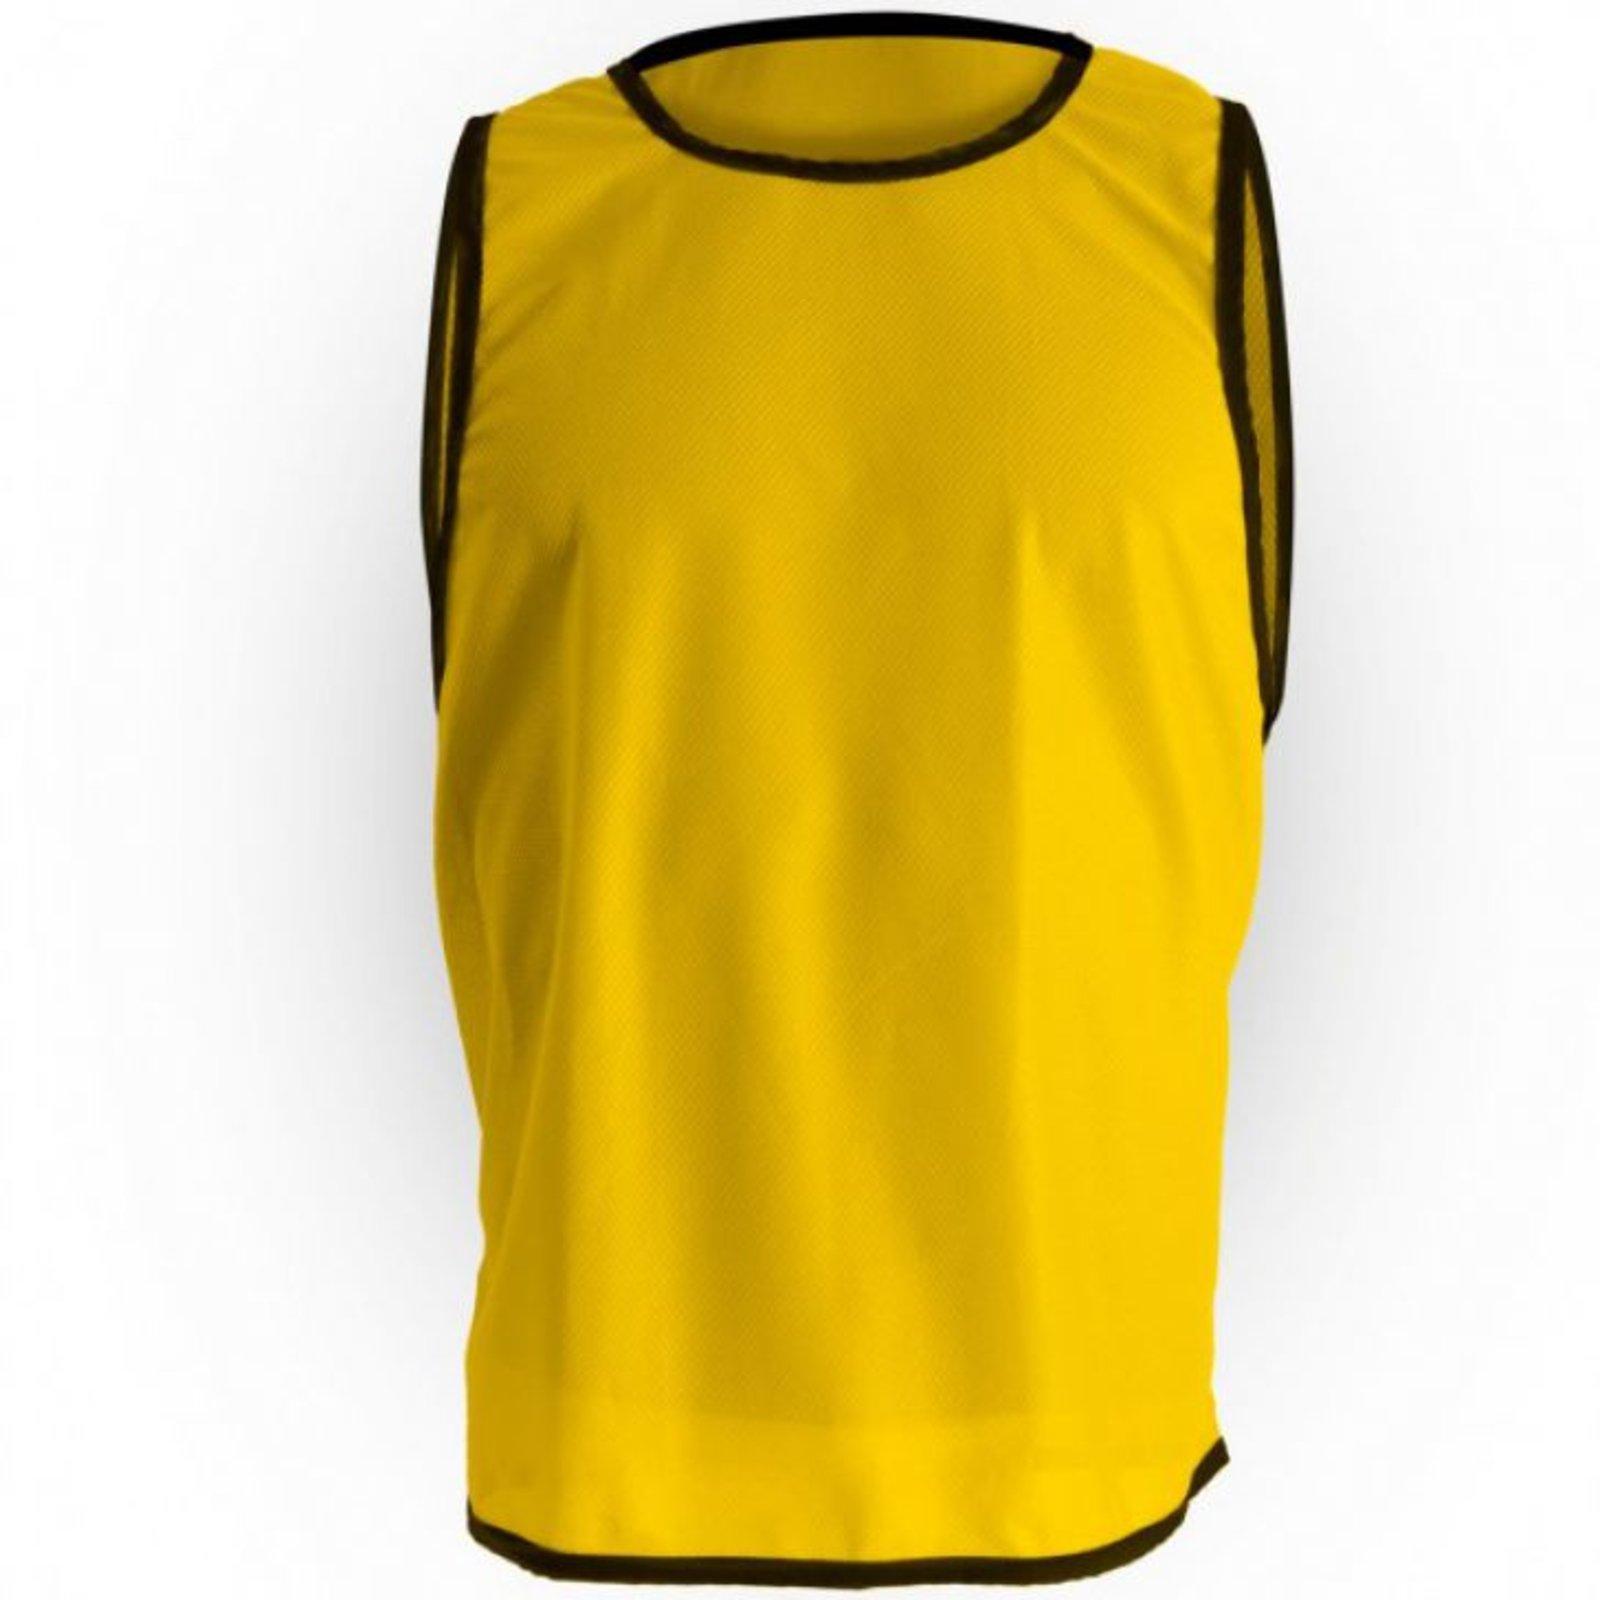 Colete de Futsal AX Esportes Soccer - Compre Agora  96bbfbaec4020